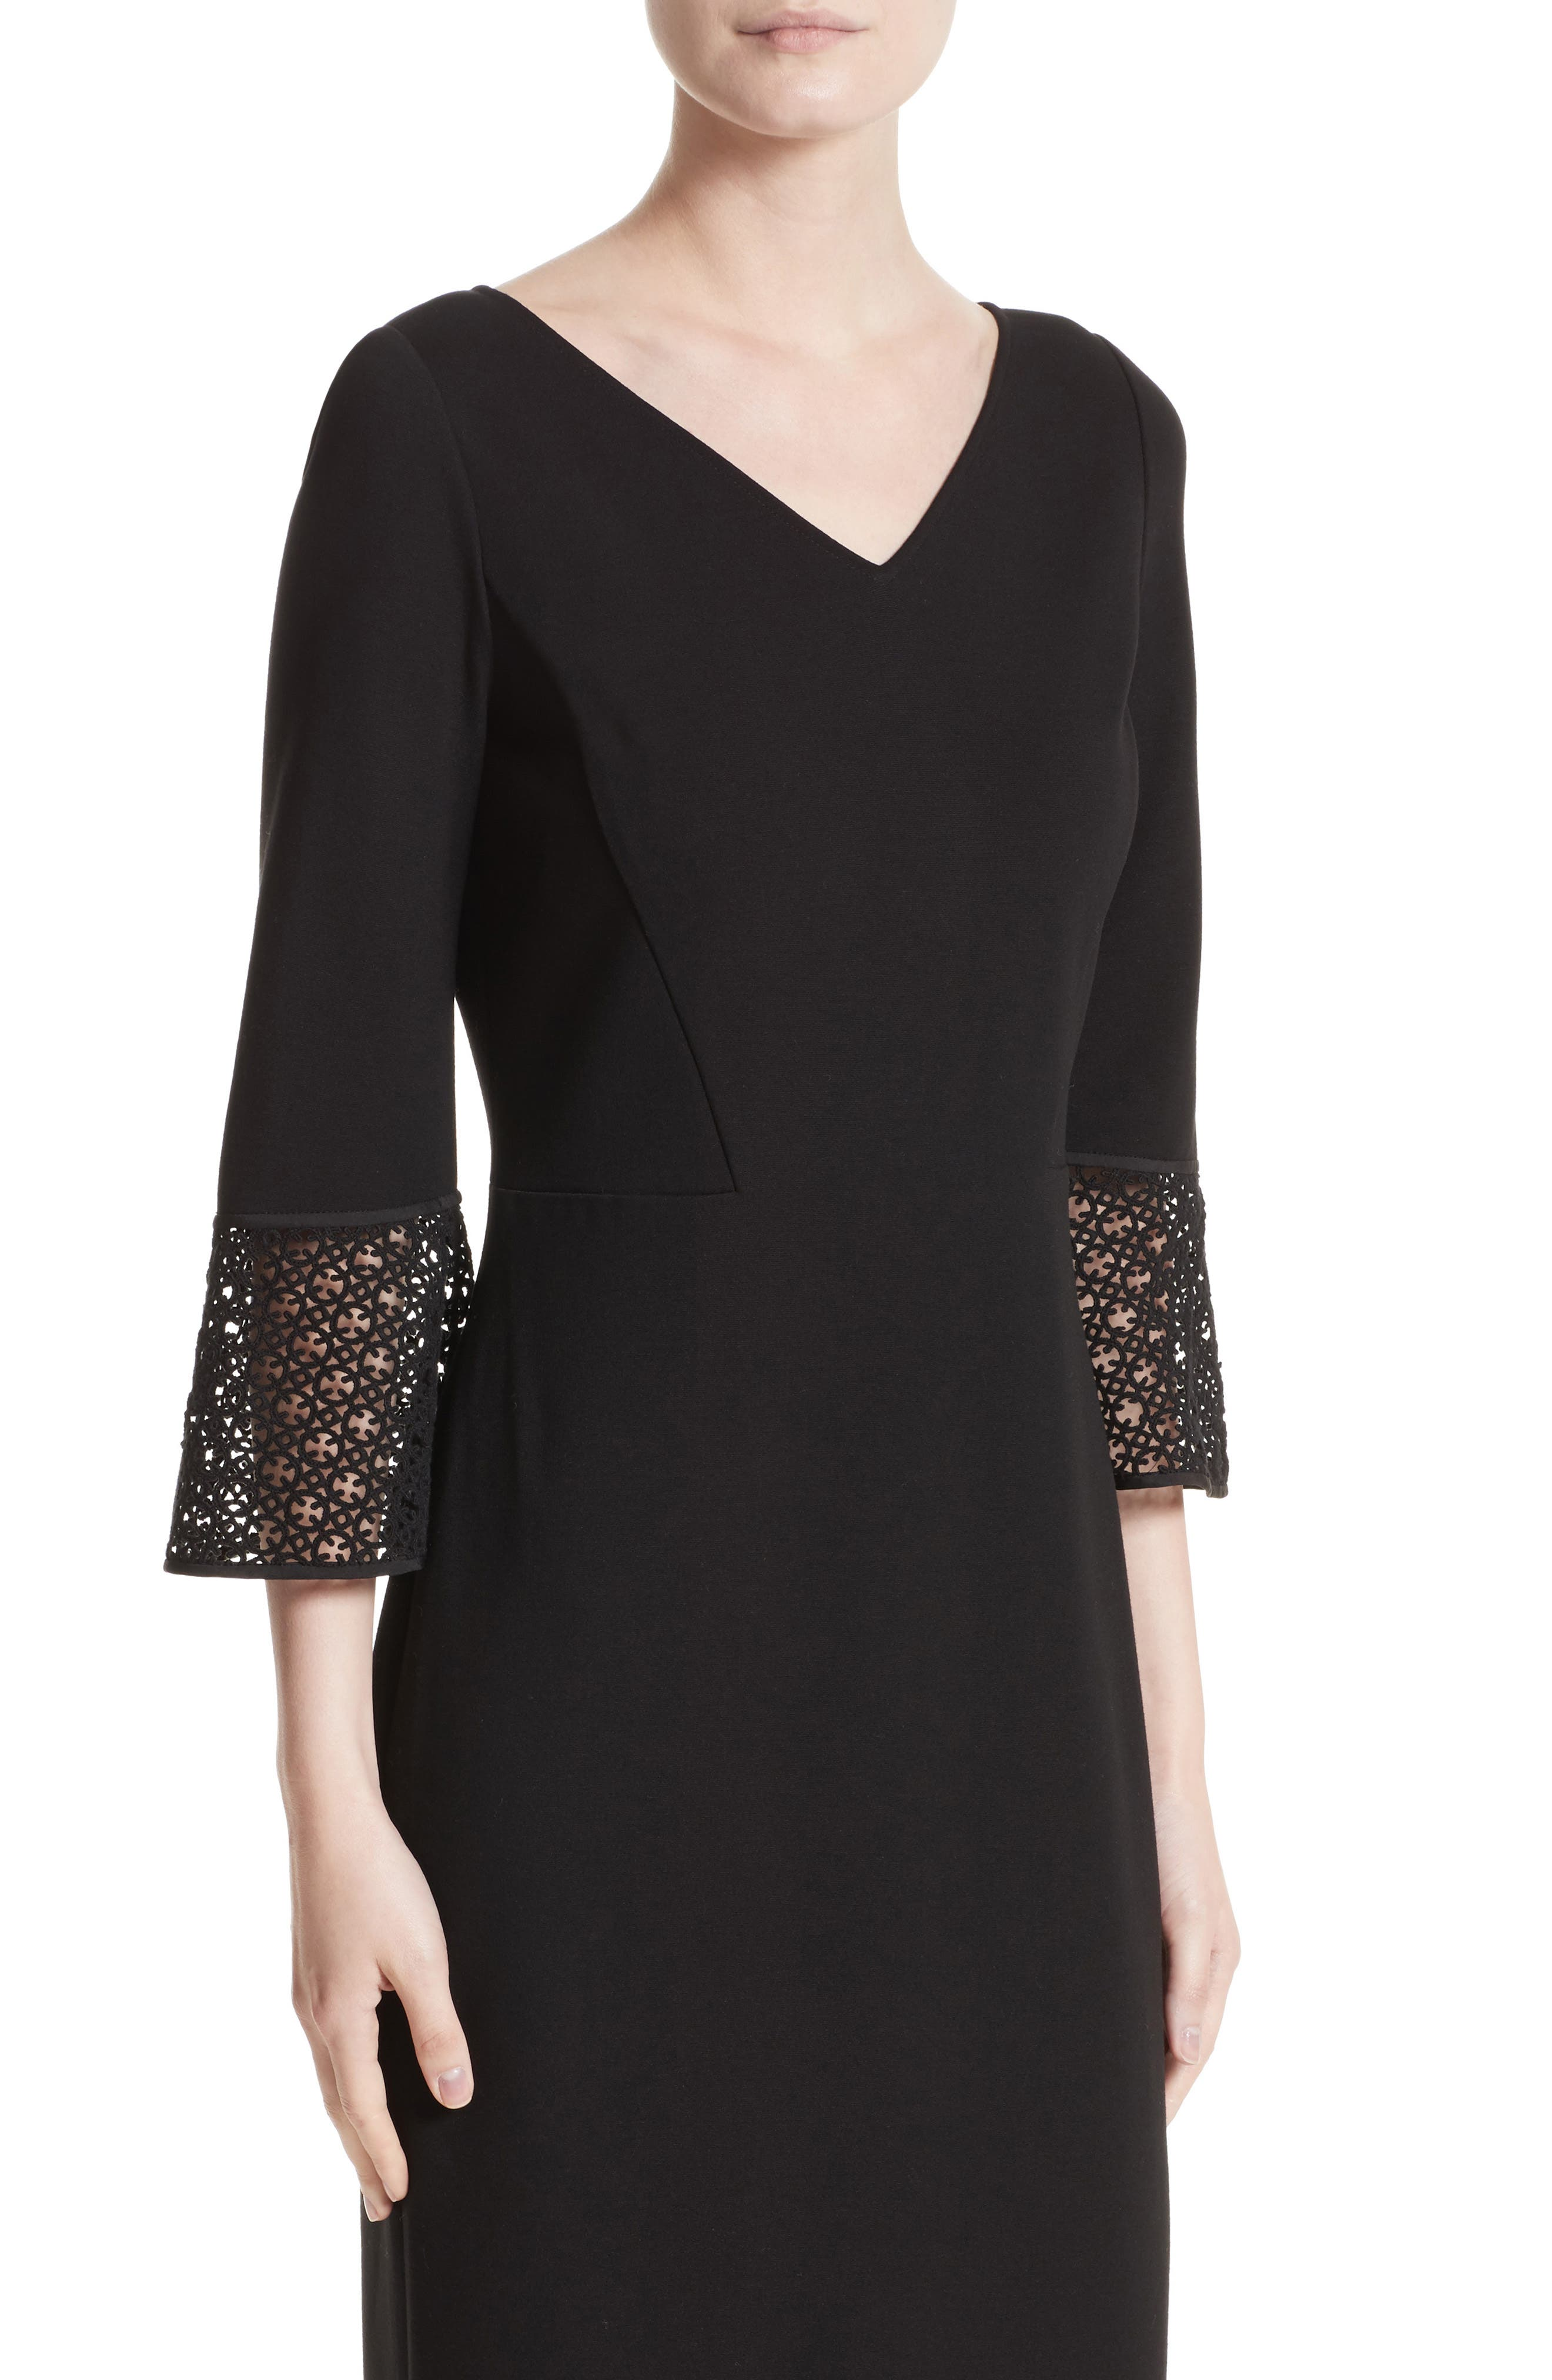 Lace Trim Sheath Dress,                             Alternate thumbnail 4, color,                             001